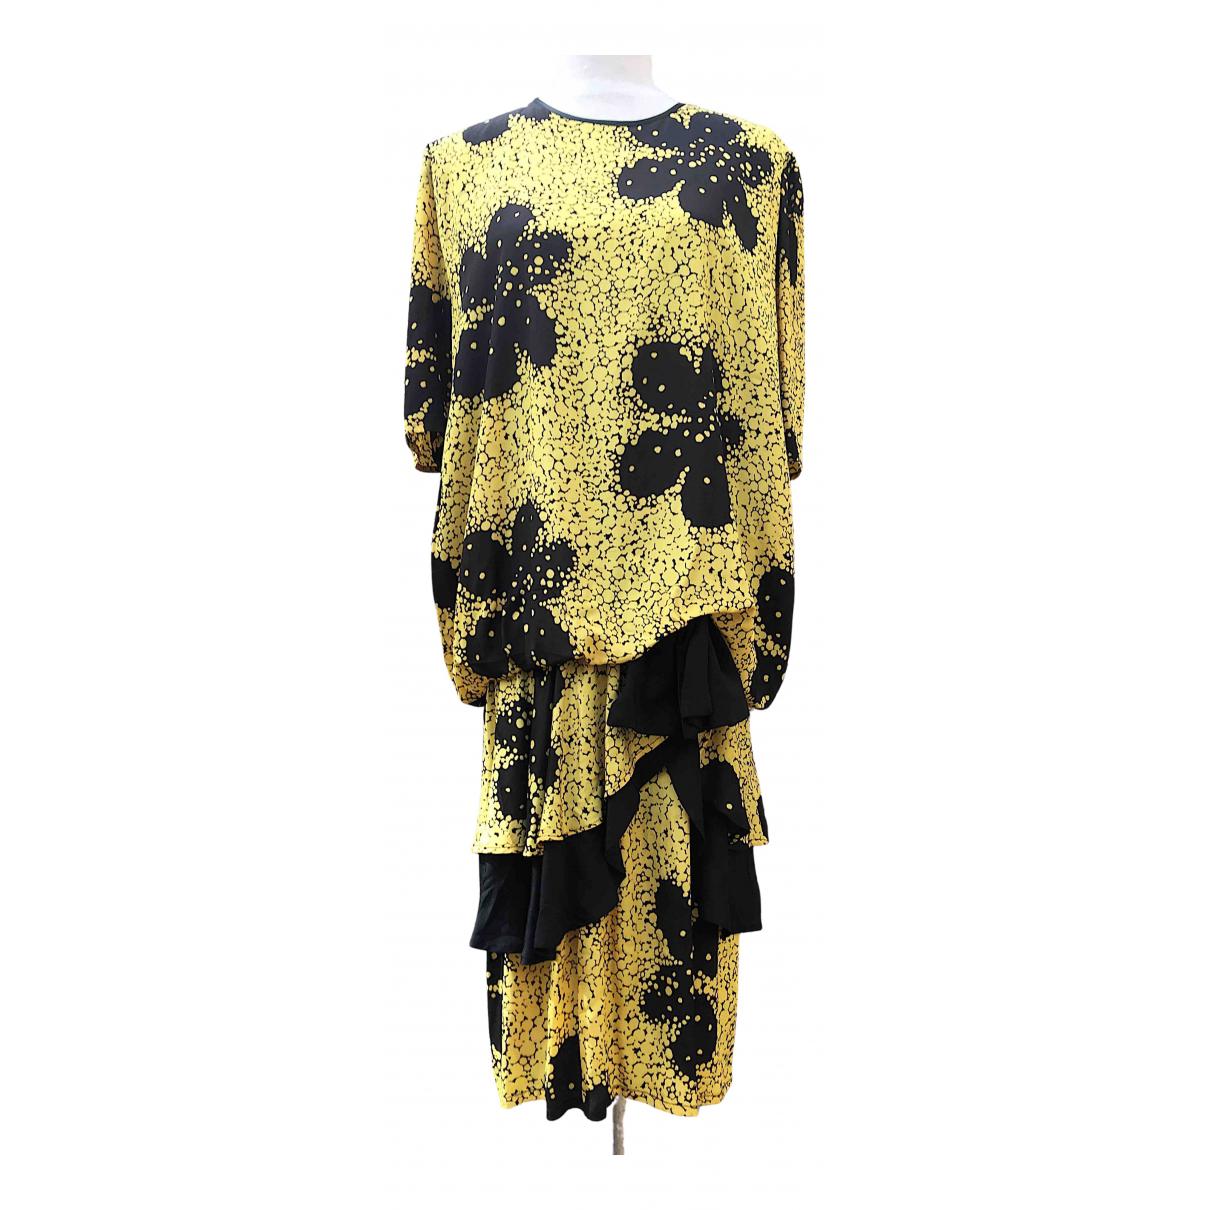 Non Signe / Unsigned Oversize Kleid in  Bunt Seide